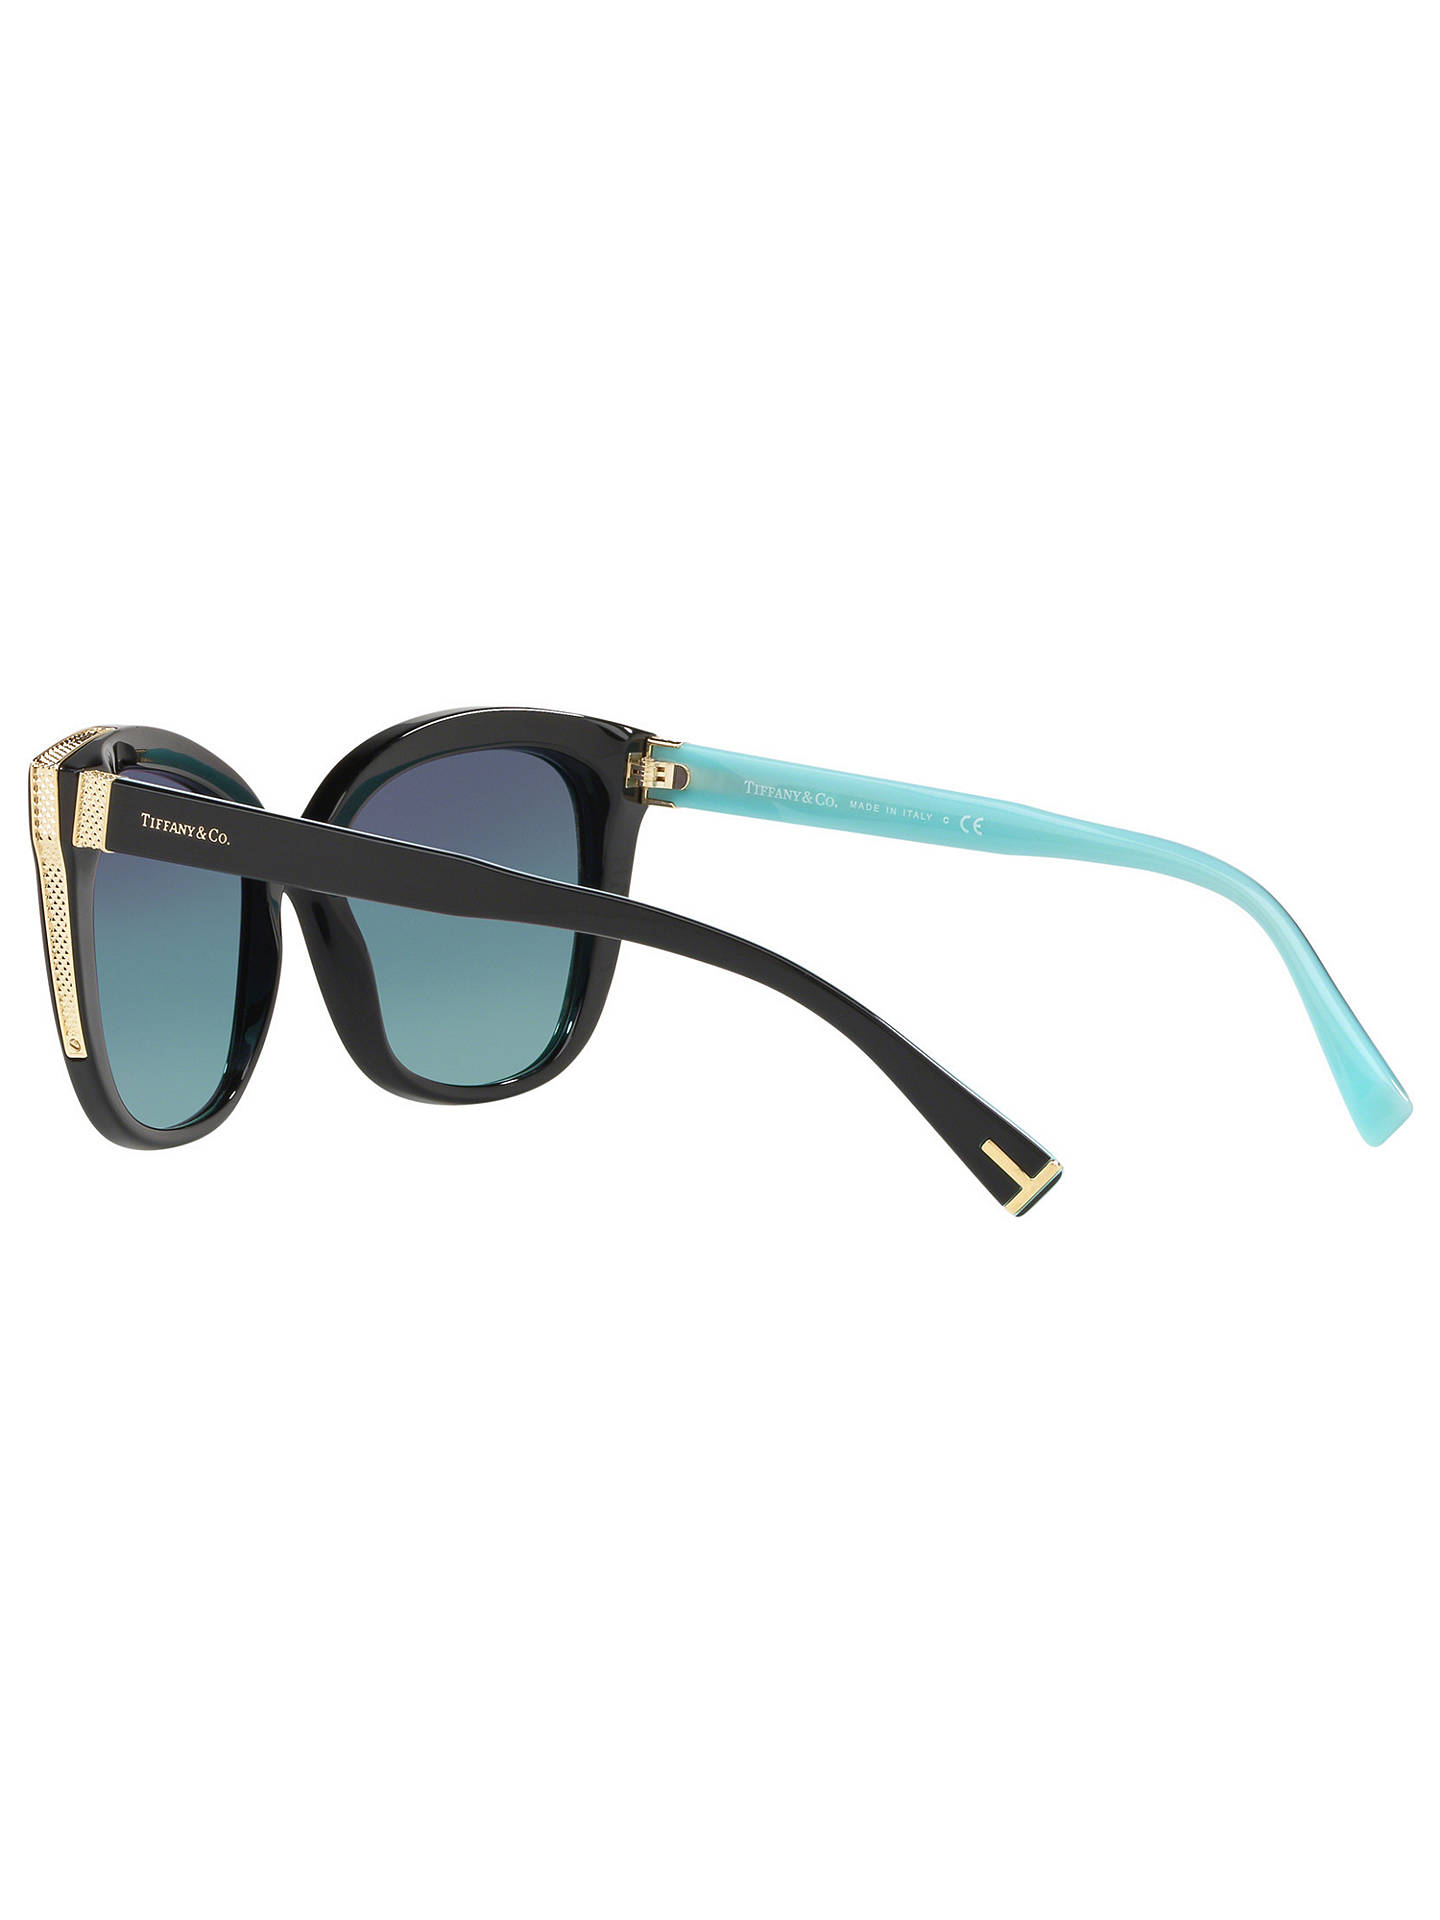 c1c4ad61b5945 Tiffany & Co TF4150 Women's Embellished Square Sunglasses, Black/Blue  Gradient